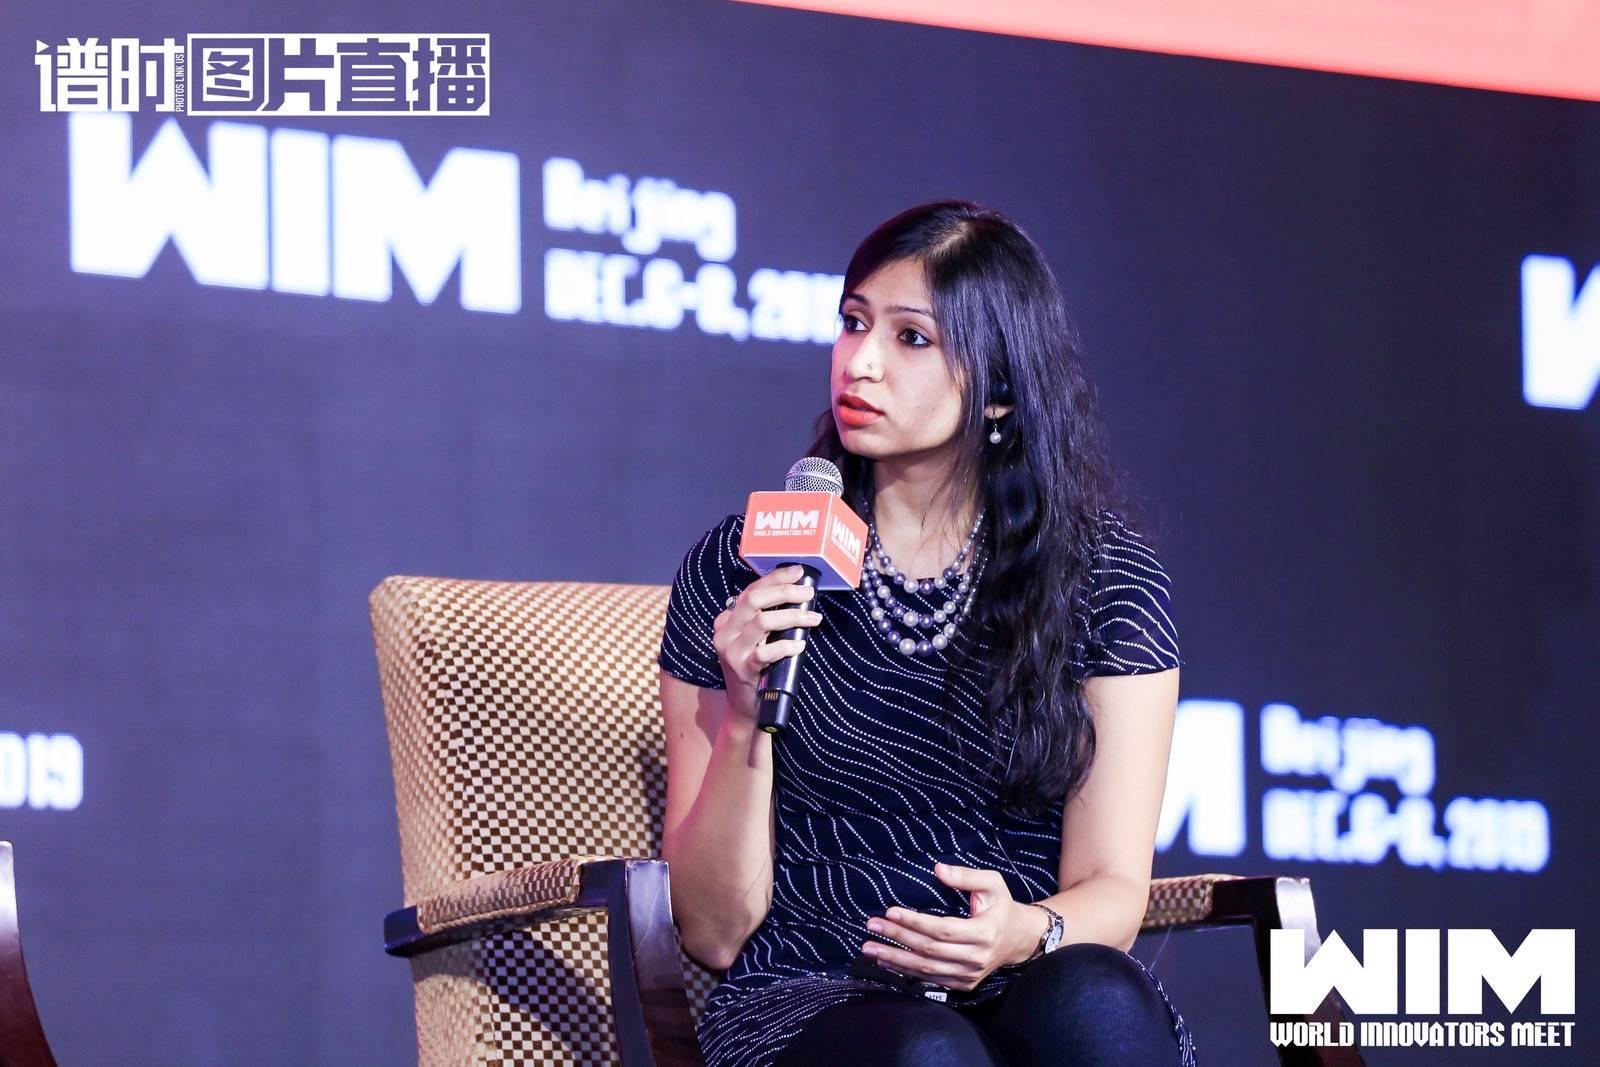 Design Cafe 联合创始人Gita Ramanan